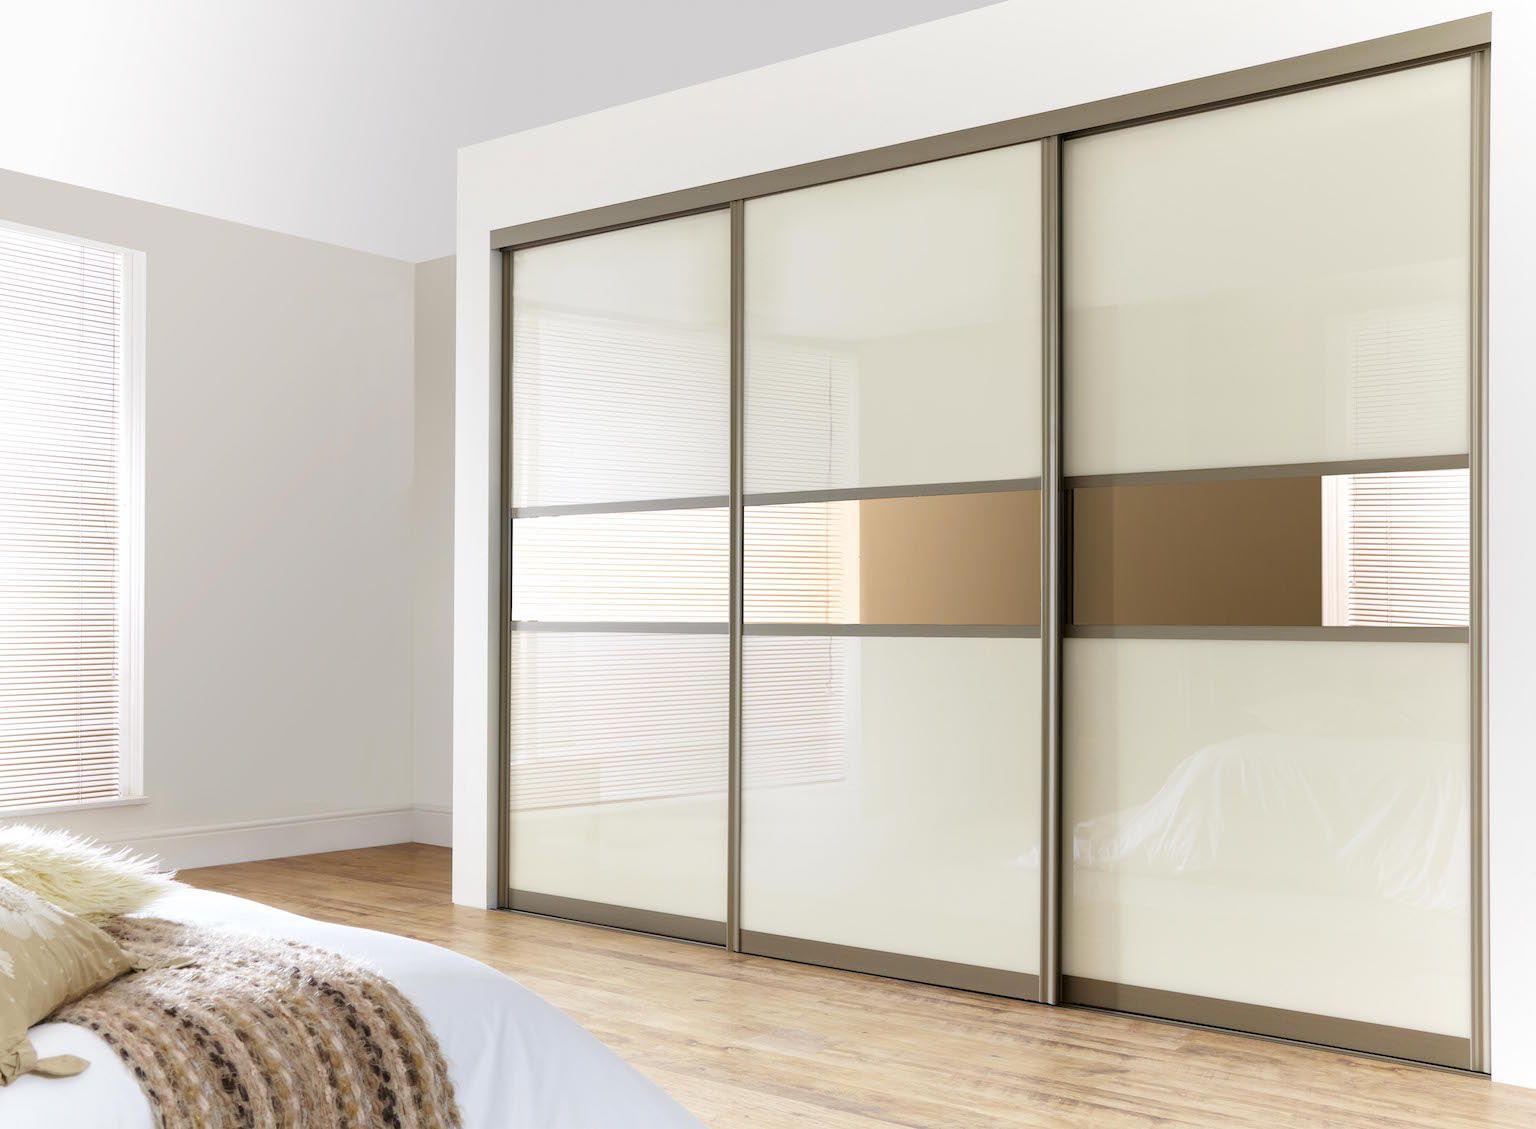 35 Modern Wardrobe Furniture Designs Sliding Door Wardrobe Designs Sliding Wardrobe Designs Sliding Wardrobe Doors